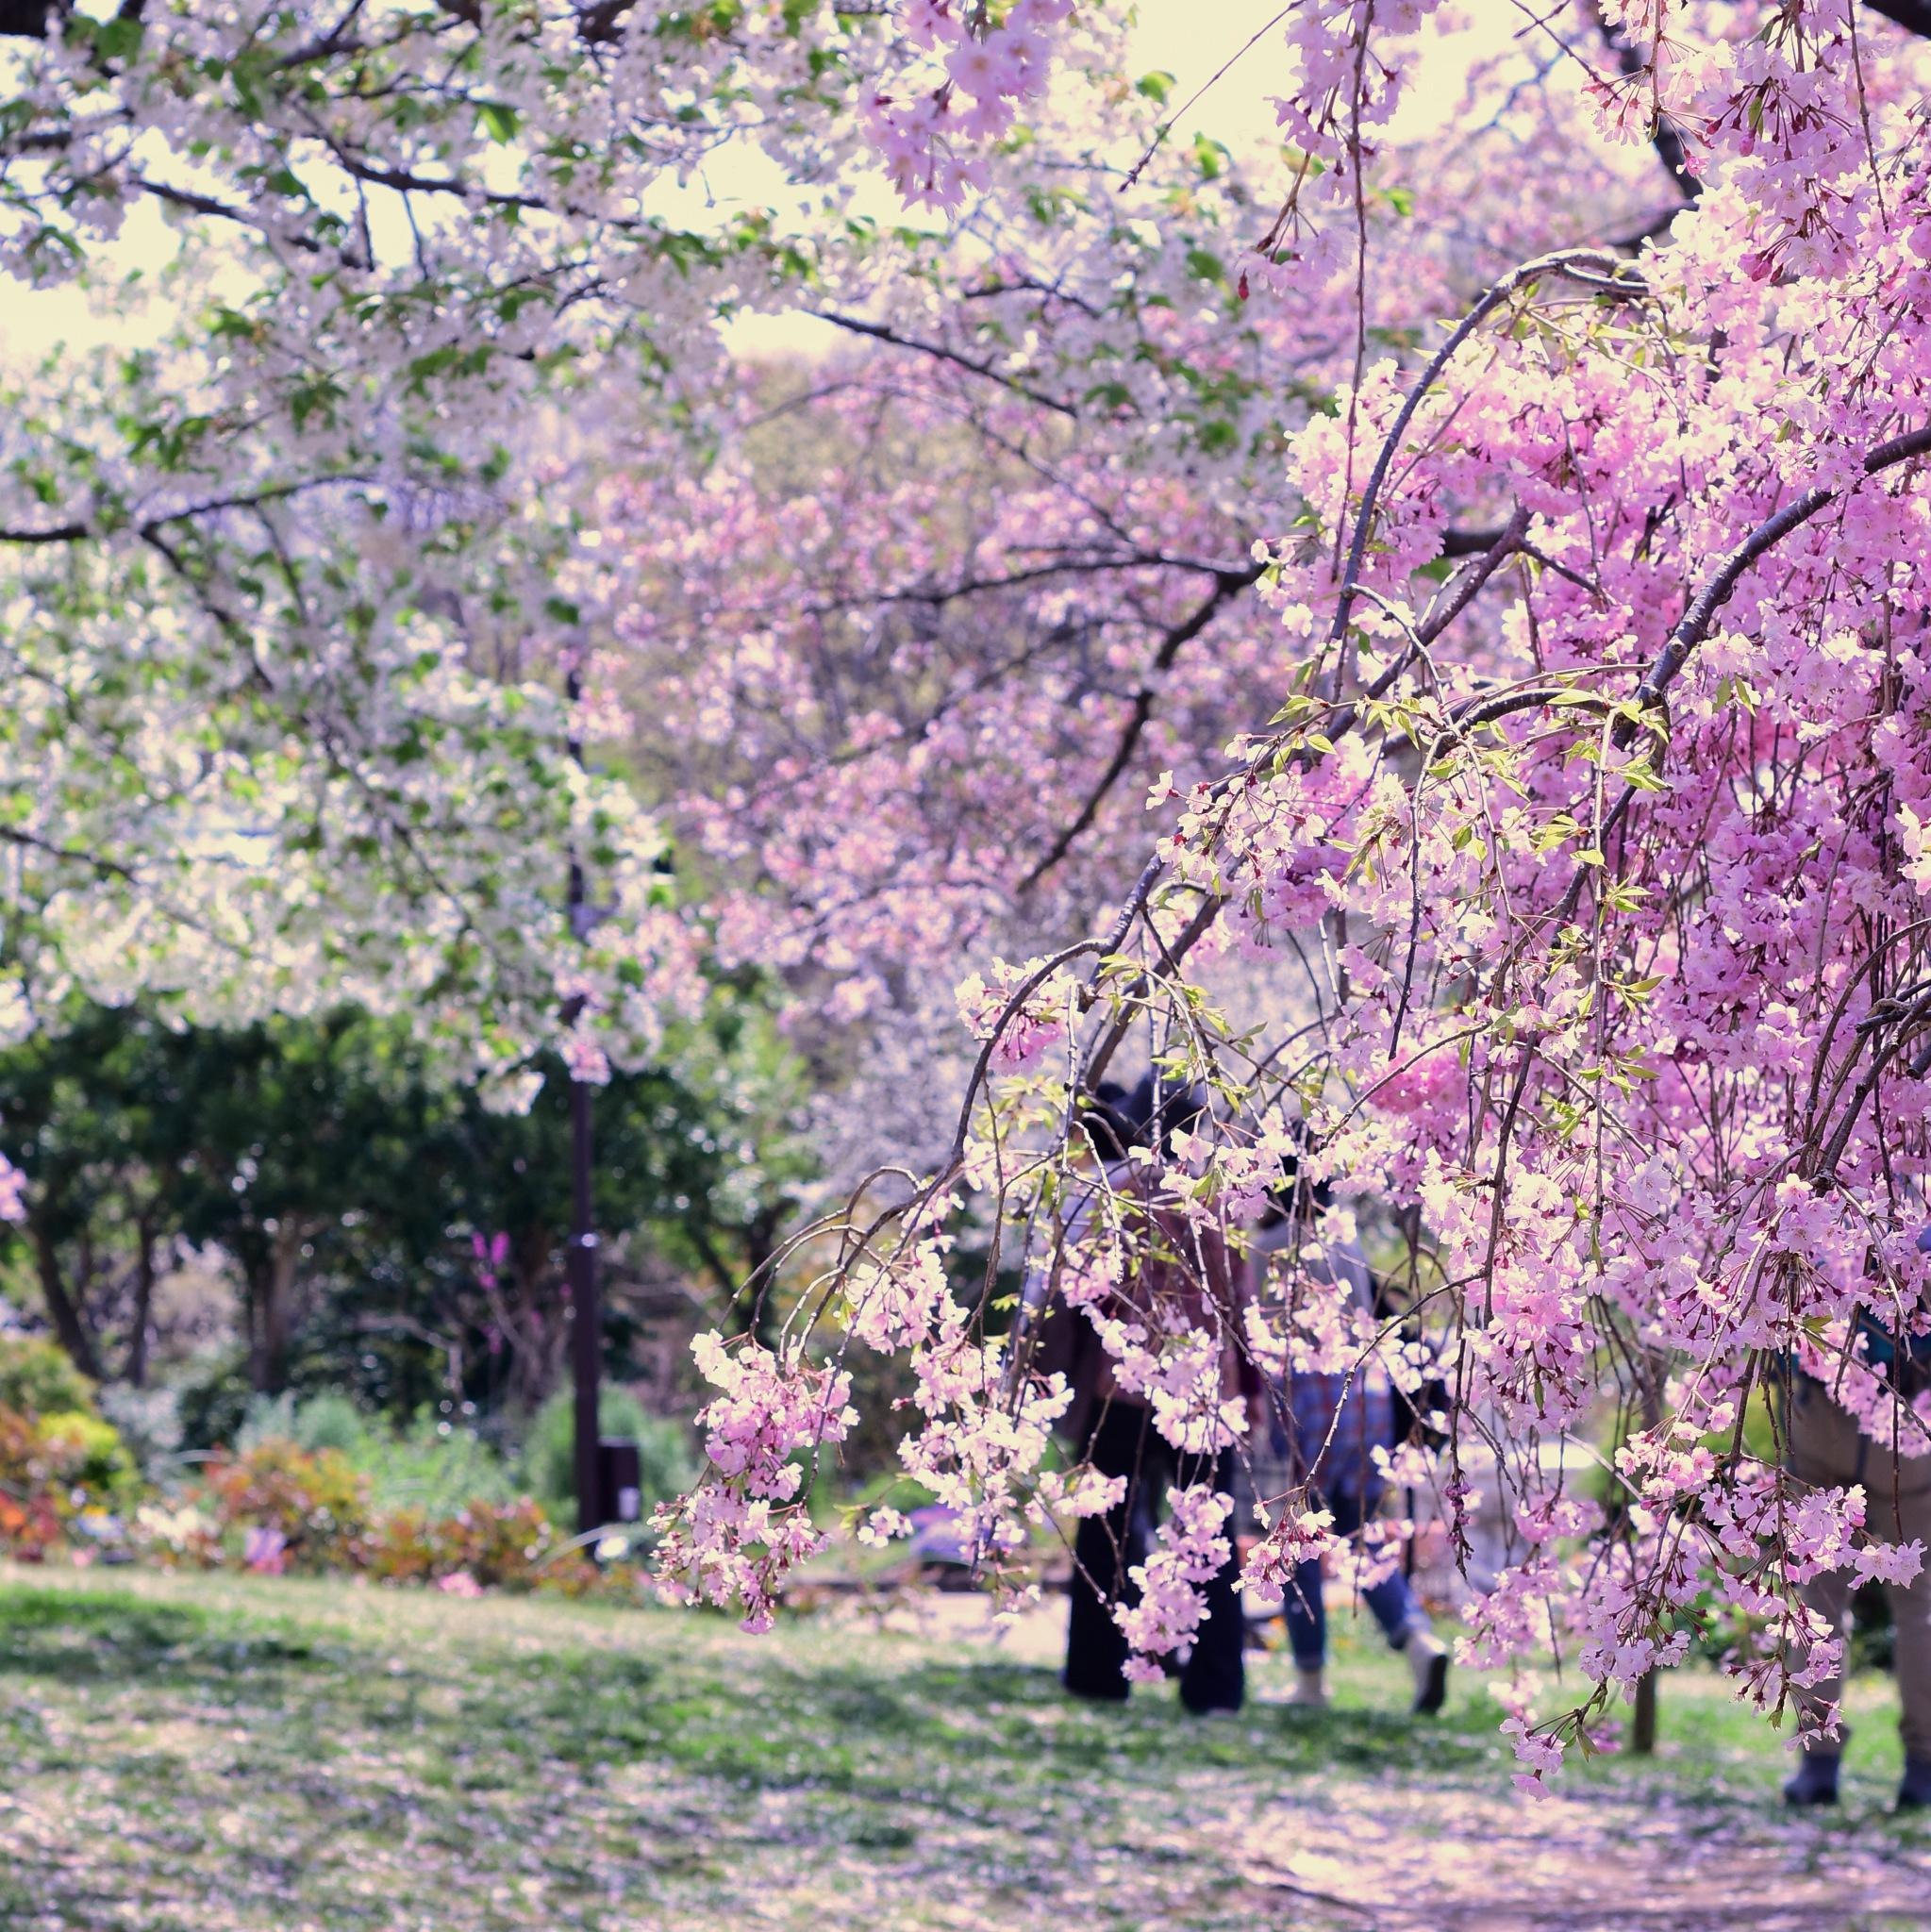 枝下桜 by kumikoxinye